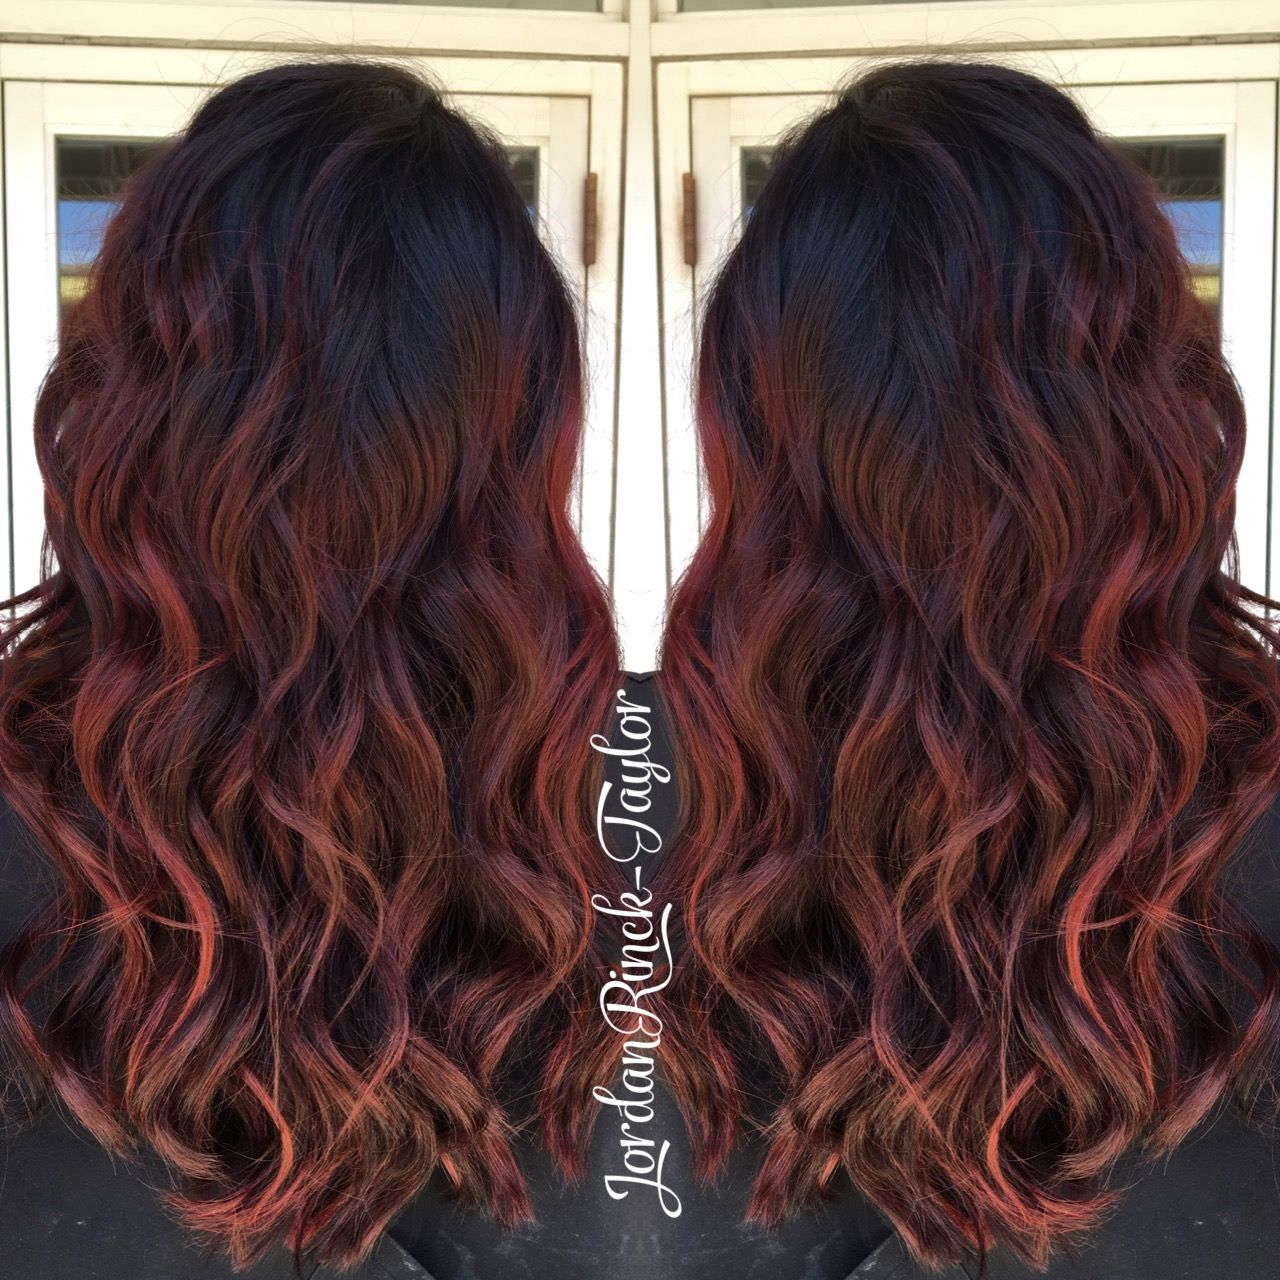 Deep Red Hair With Dark Shadow Roots Instagram Jordanrincktaylor Red Hair Dark Roots Hair Shadow Deep Auburn Hair